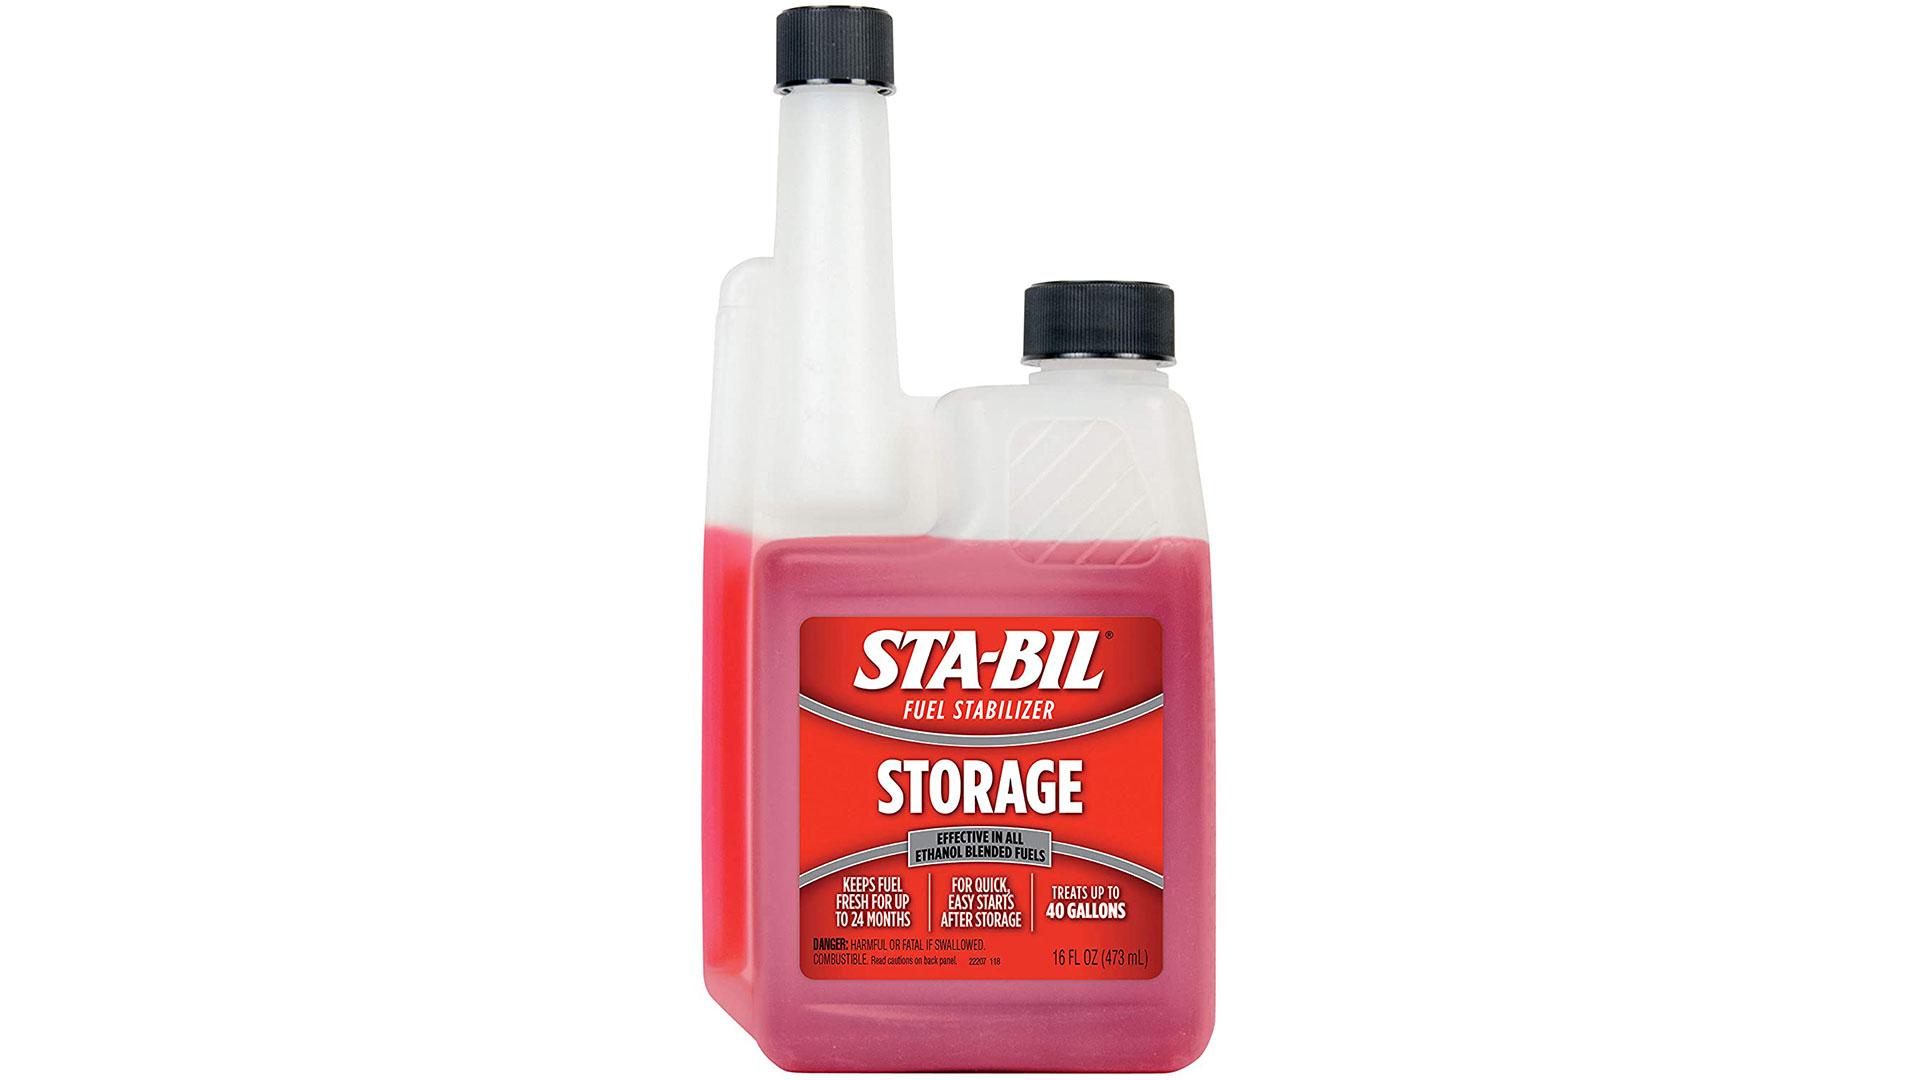 sta-bil fuel stabiliser